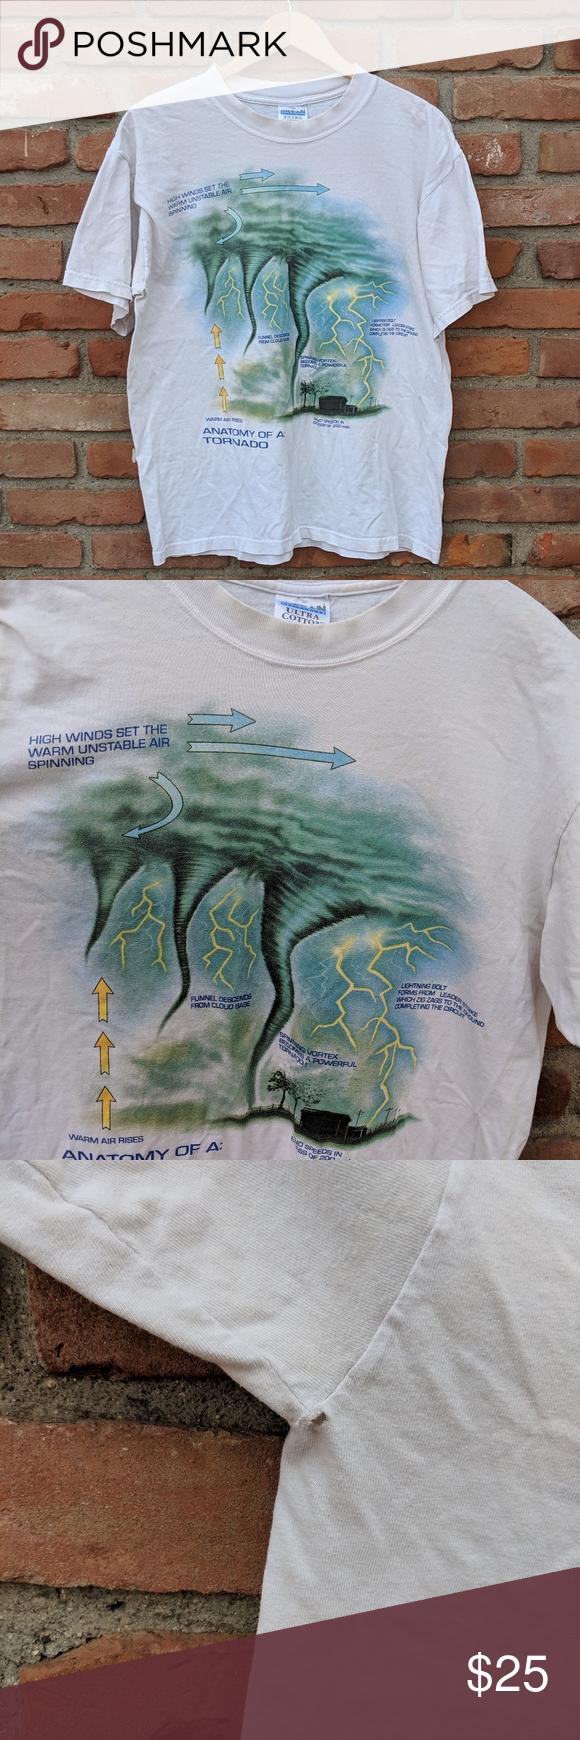 Vintage Anatomy Of A Tornadohurricane T Shirt In 2018 My Posh